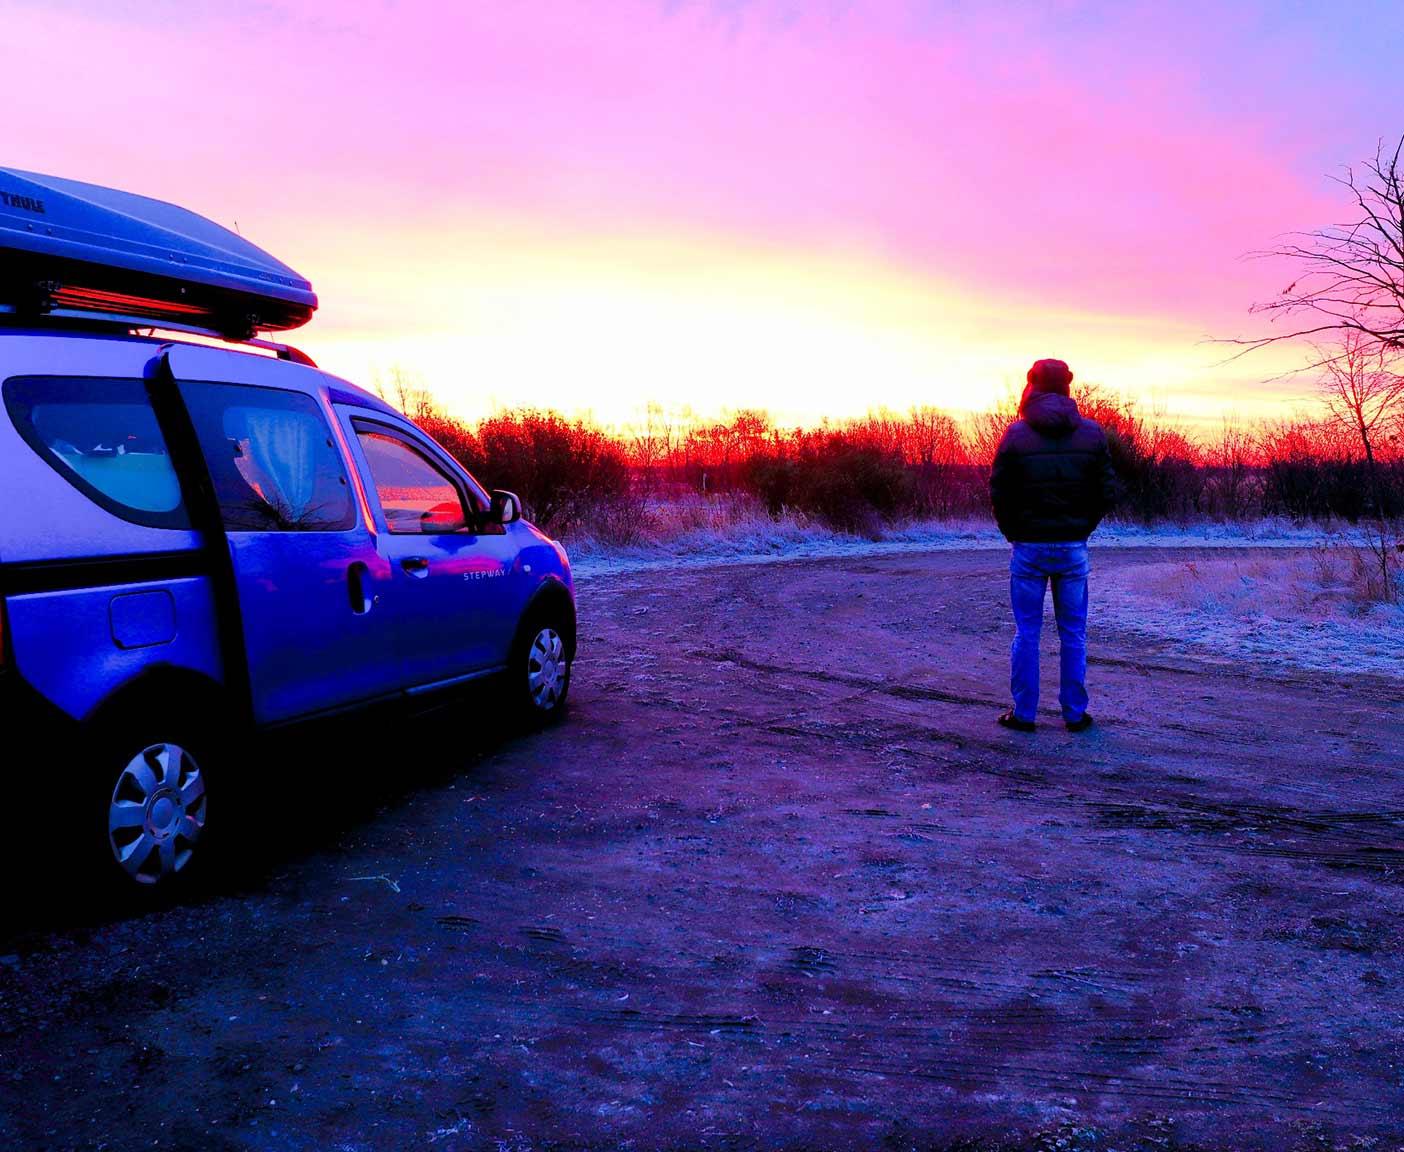 Dacia-stepway-preis-mikrocamper-automatik-kombi-logan-rene kreher